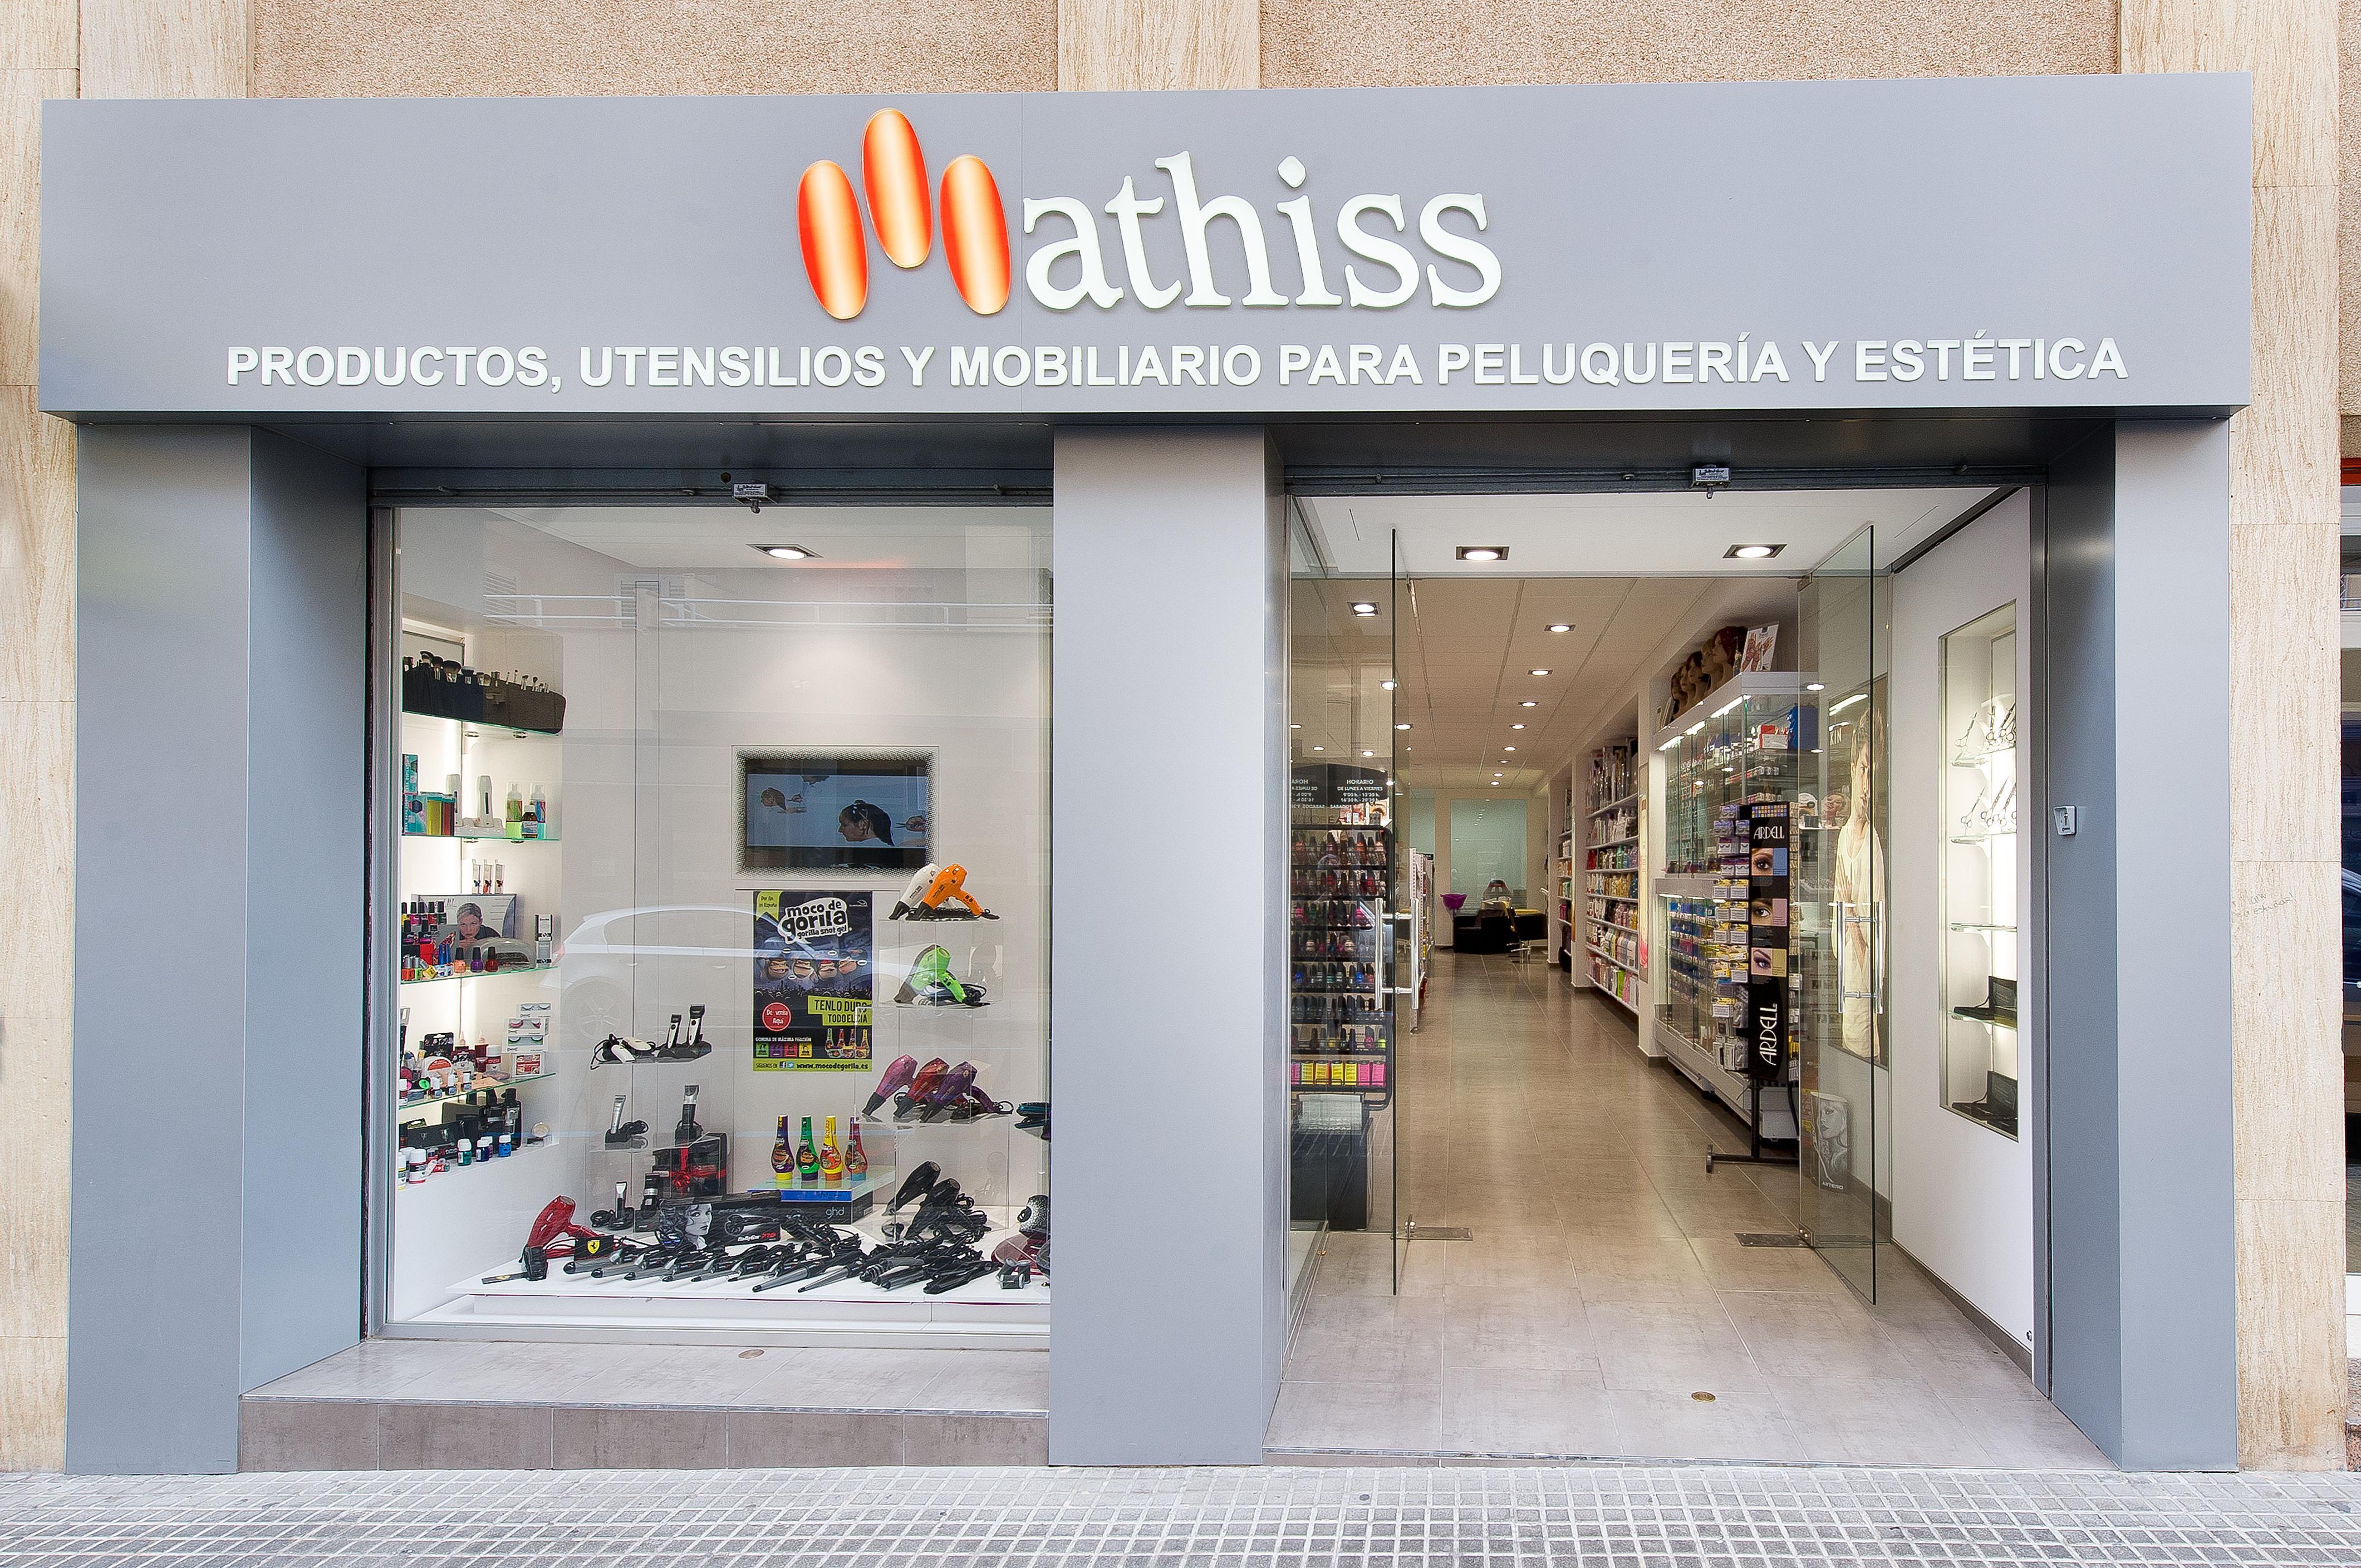 Foto 17 de Suministros para peluquerías y estética  en Ibiza | Mathiss